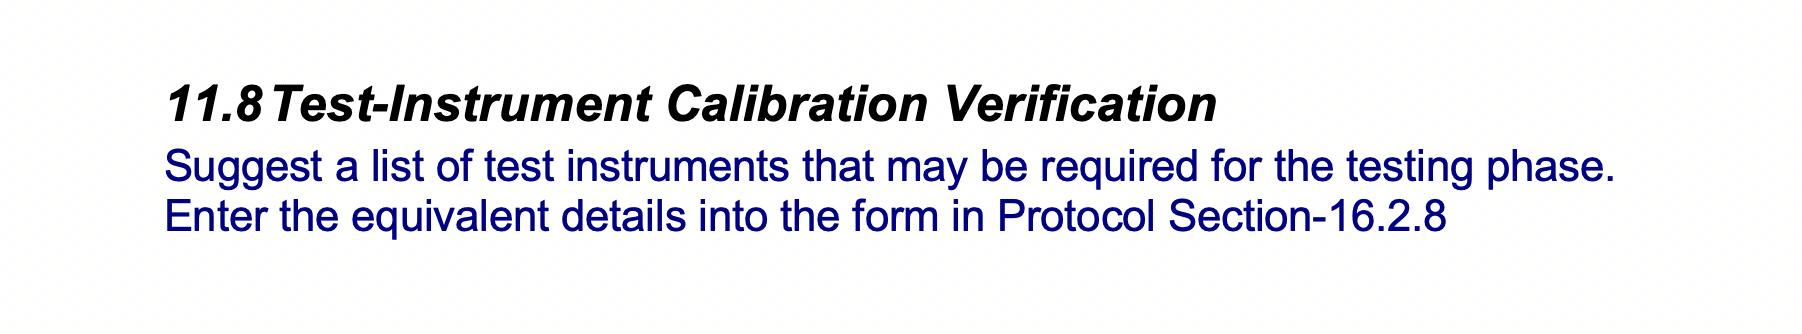 Test-Instrument-Calibration-Verification-GetReskilled